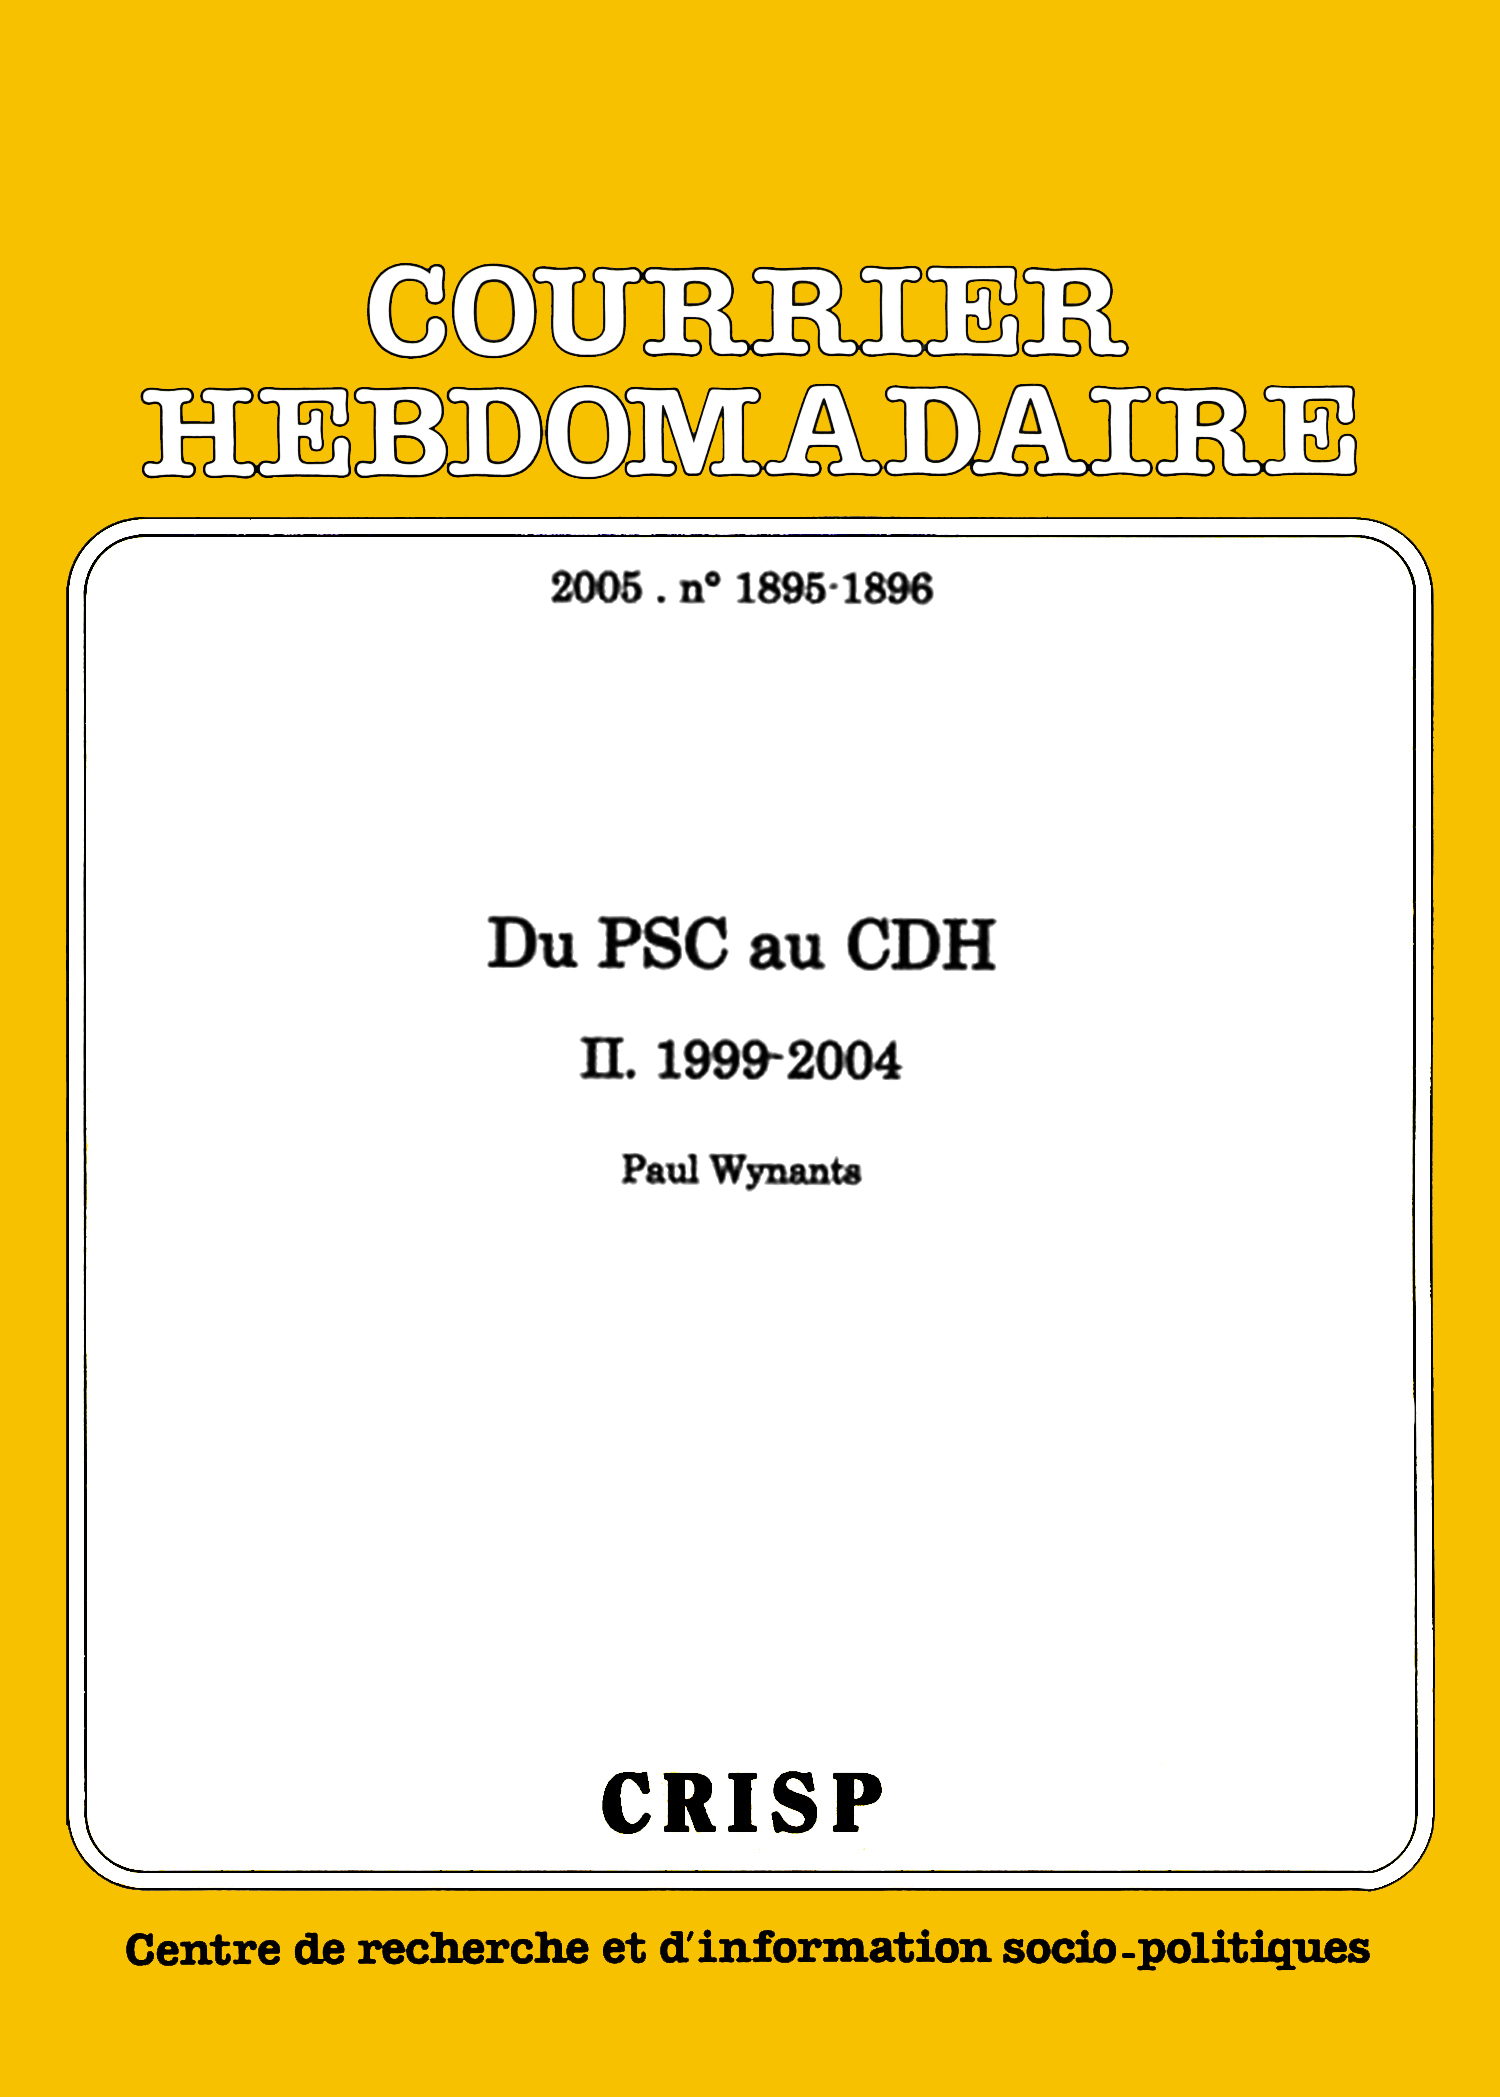 Du PSC au CDH | Cairn.info